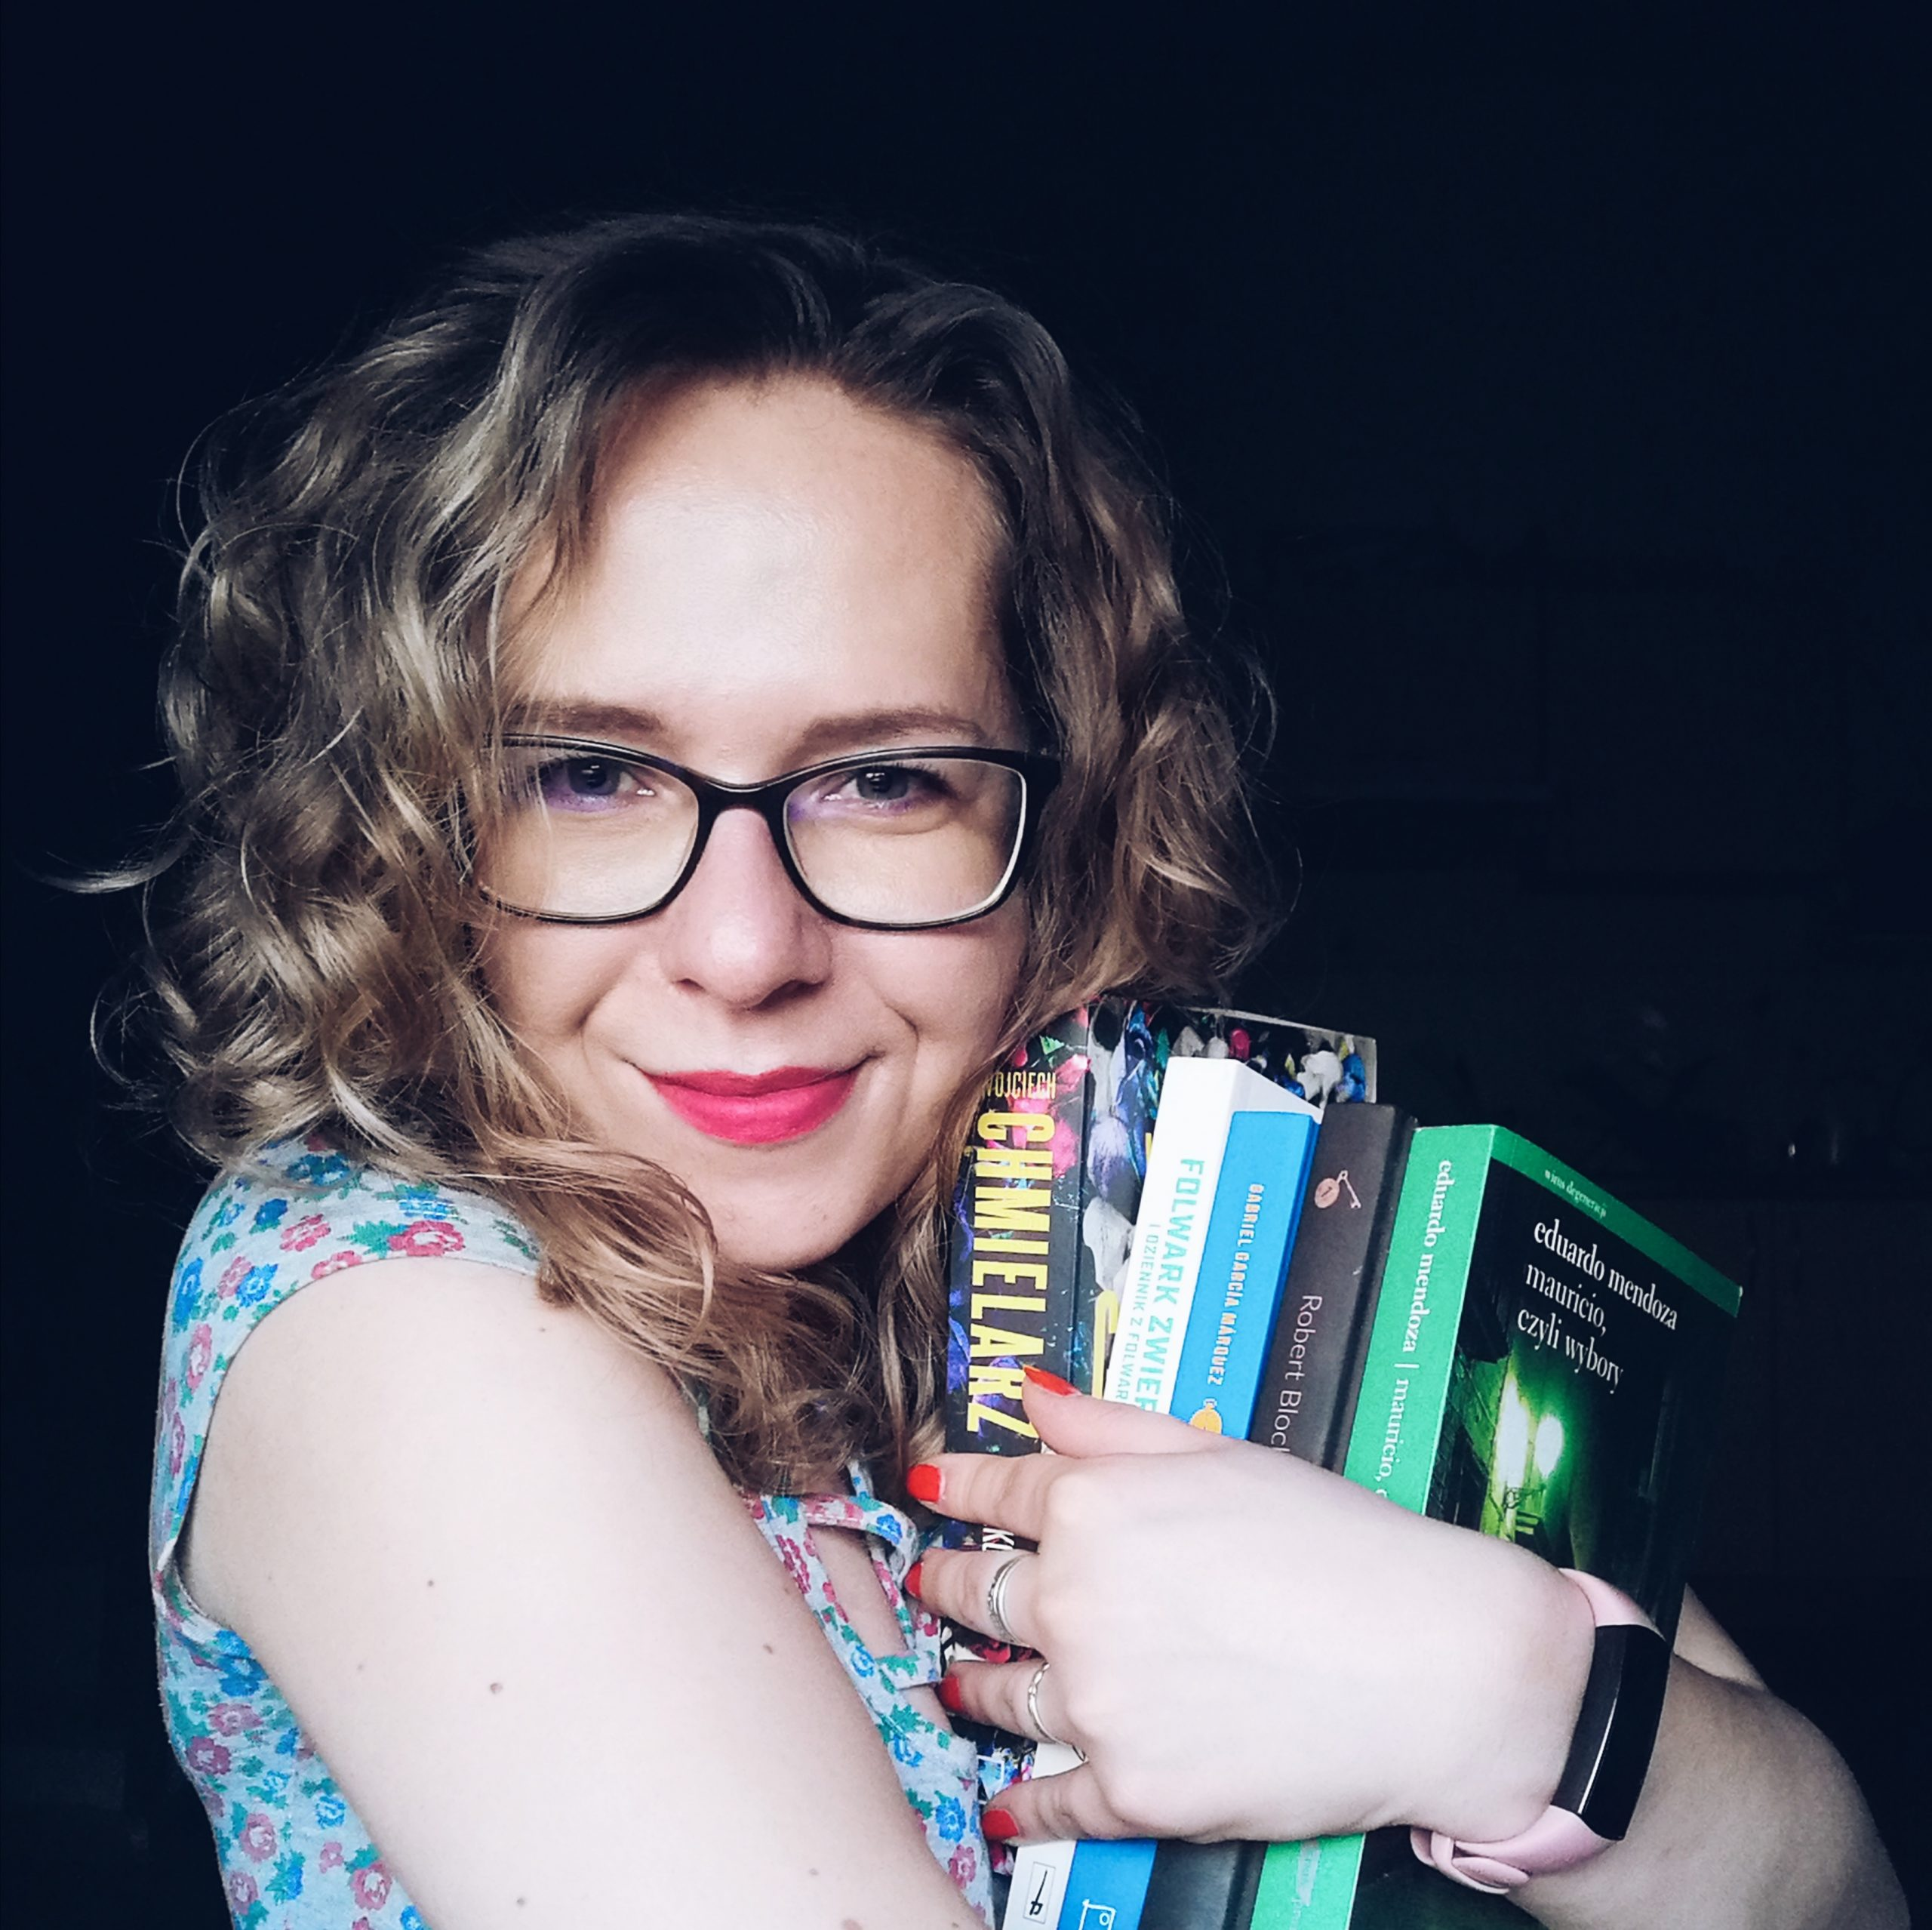 agata czyta książki